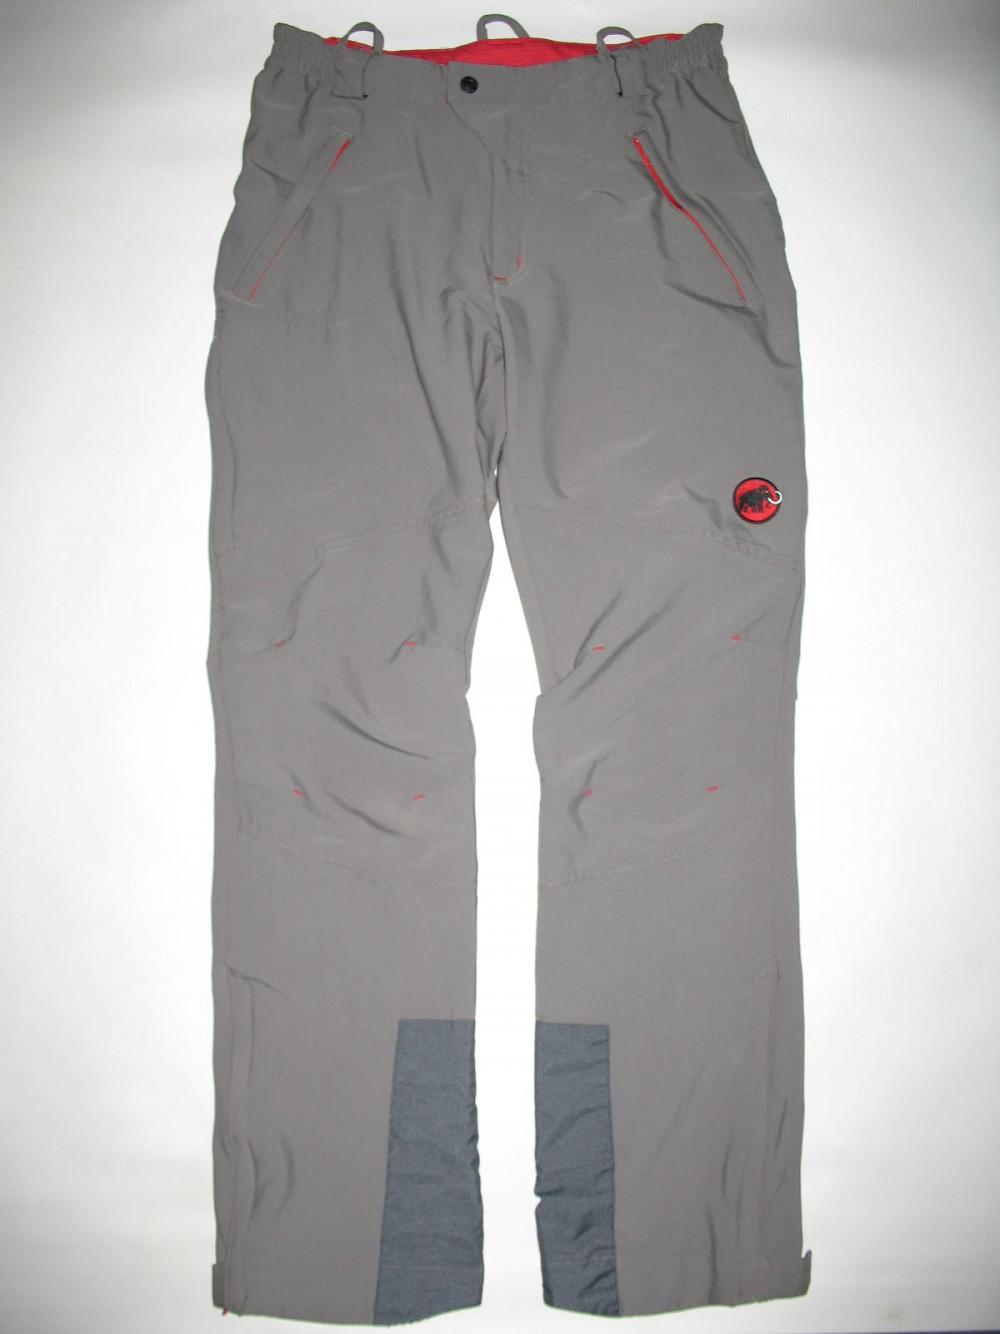 Штаны MAMMUT 3xdry outdoor pants (размер 48-M/L) - 2